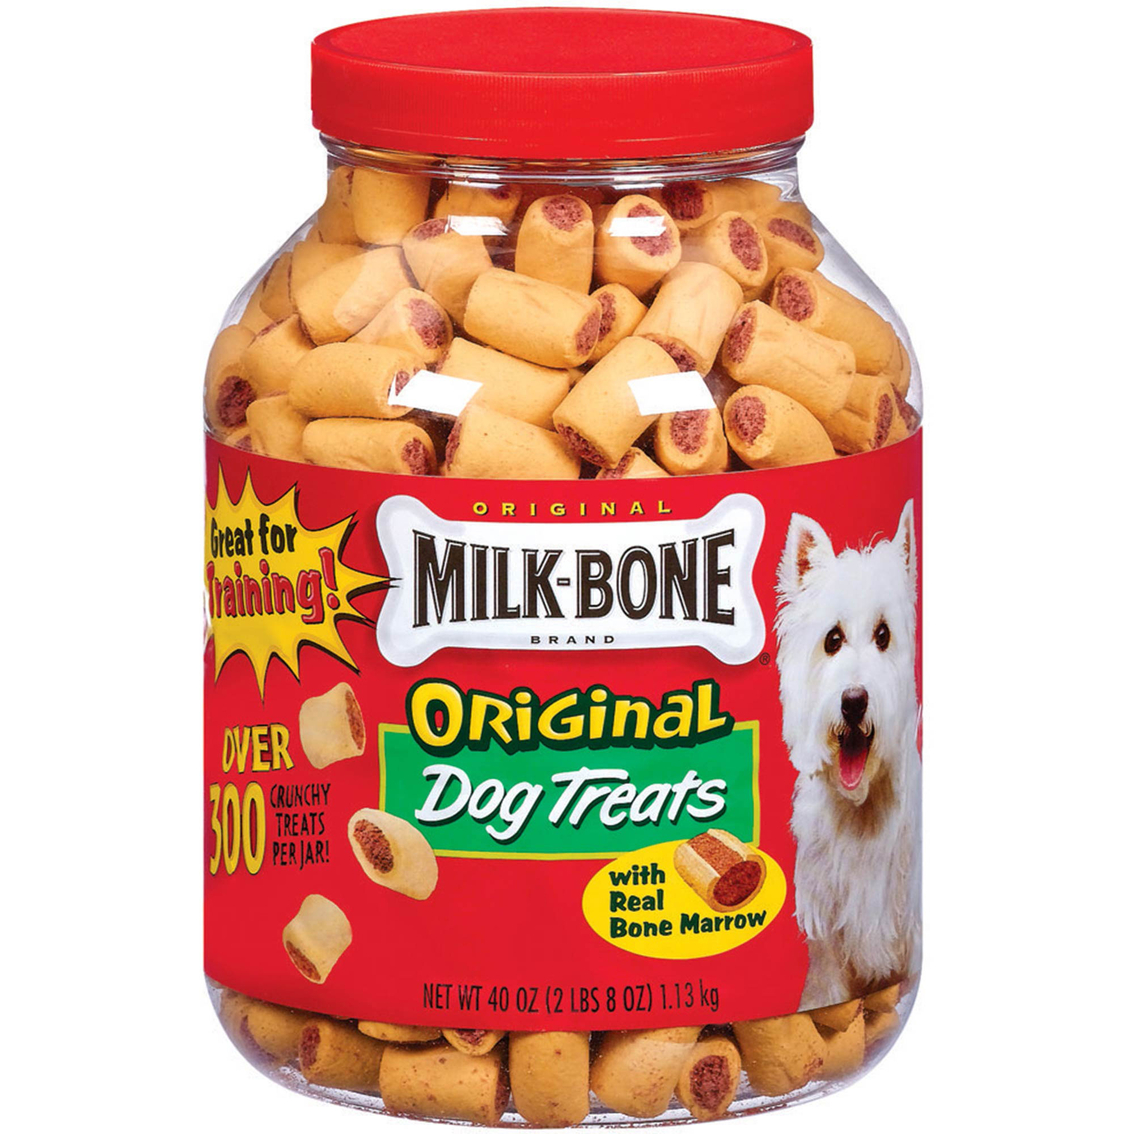 Milk Bone Original Dog Treats 40 Oz